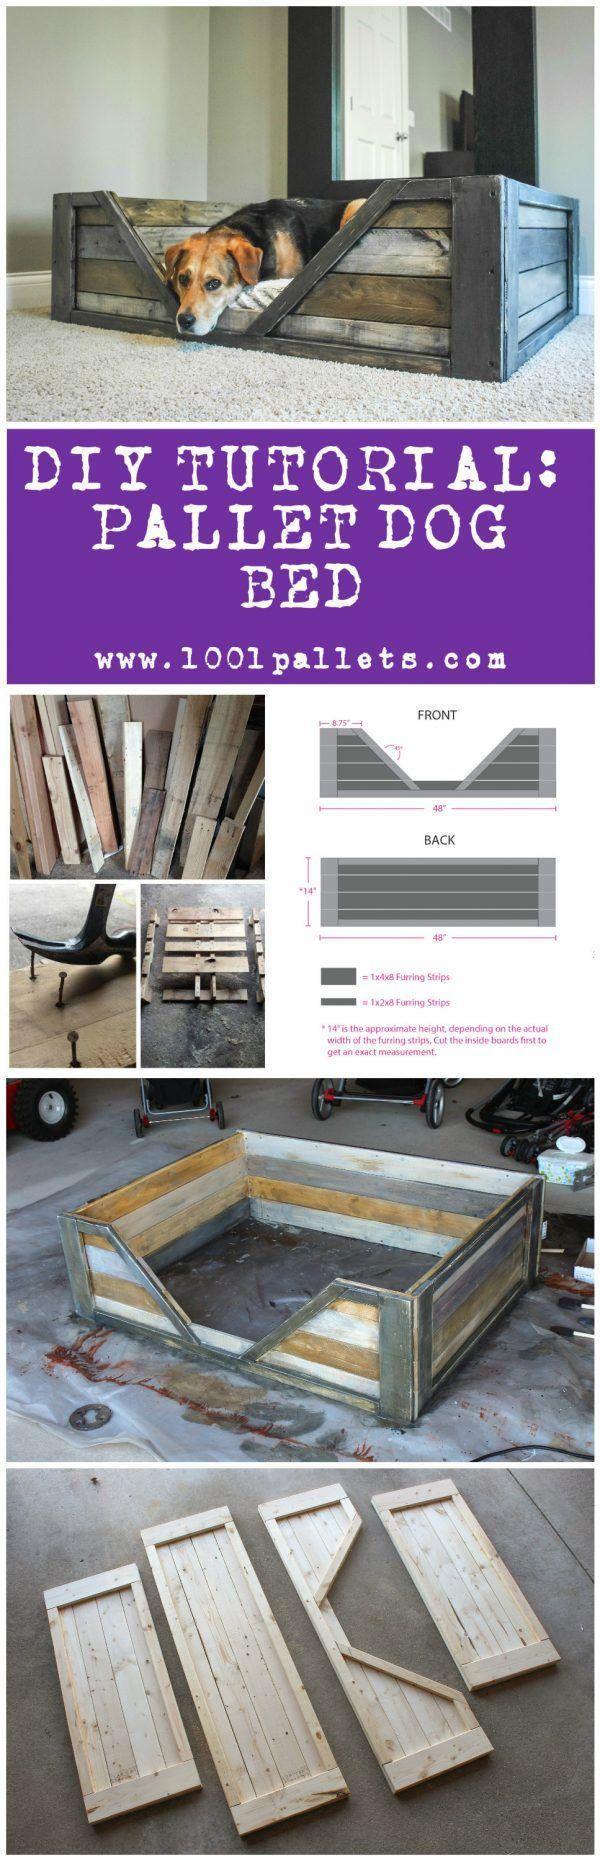 Photo of DIY PDF Tutorial Pallet Dog Bed • 1001 Pallets • FREE DOWNLOAD